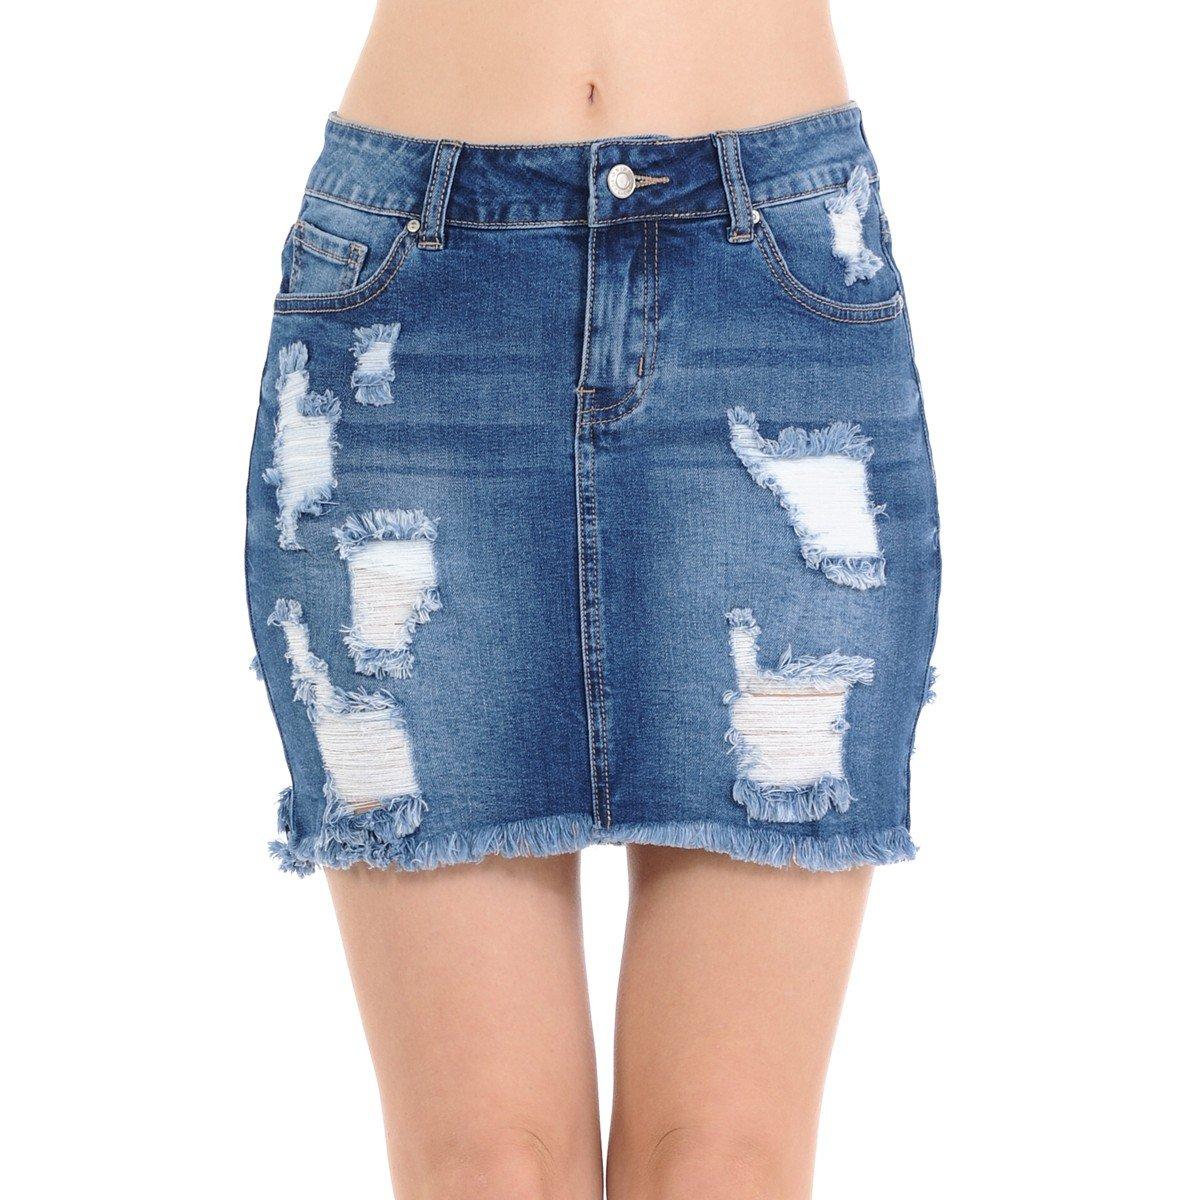 NioBe Clothing Wax Women's Denim Frayed Destruction Distressed Hem Skirt (Small, Medium Denim)